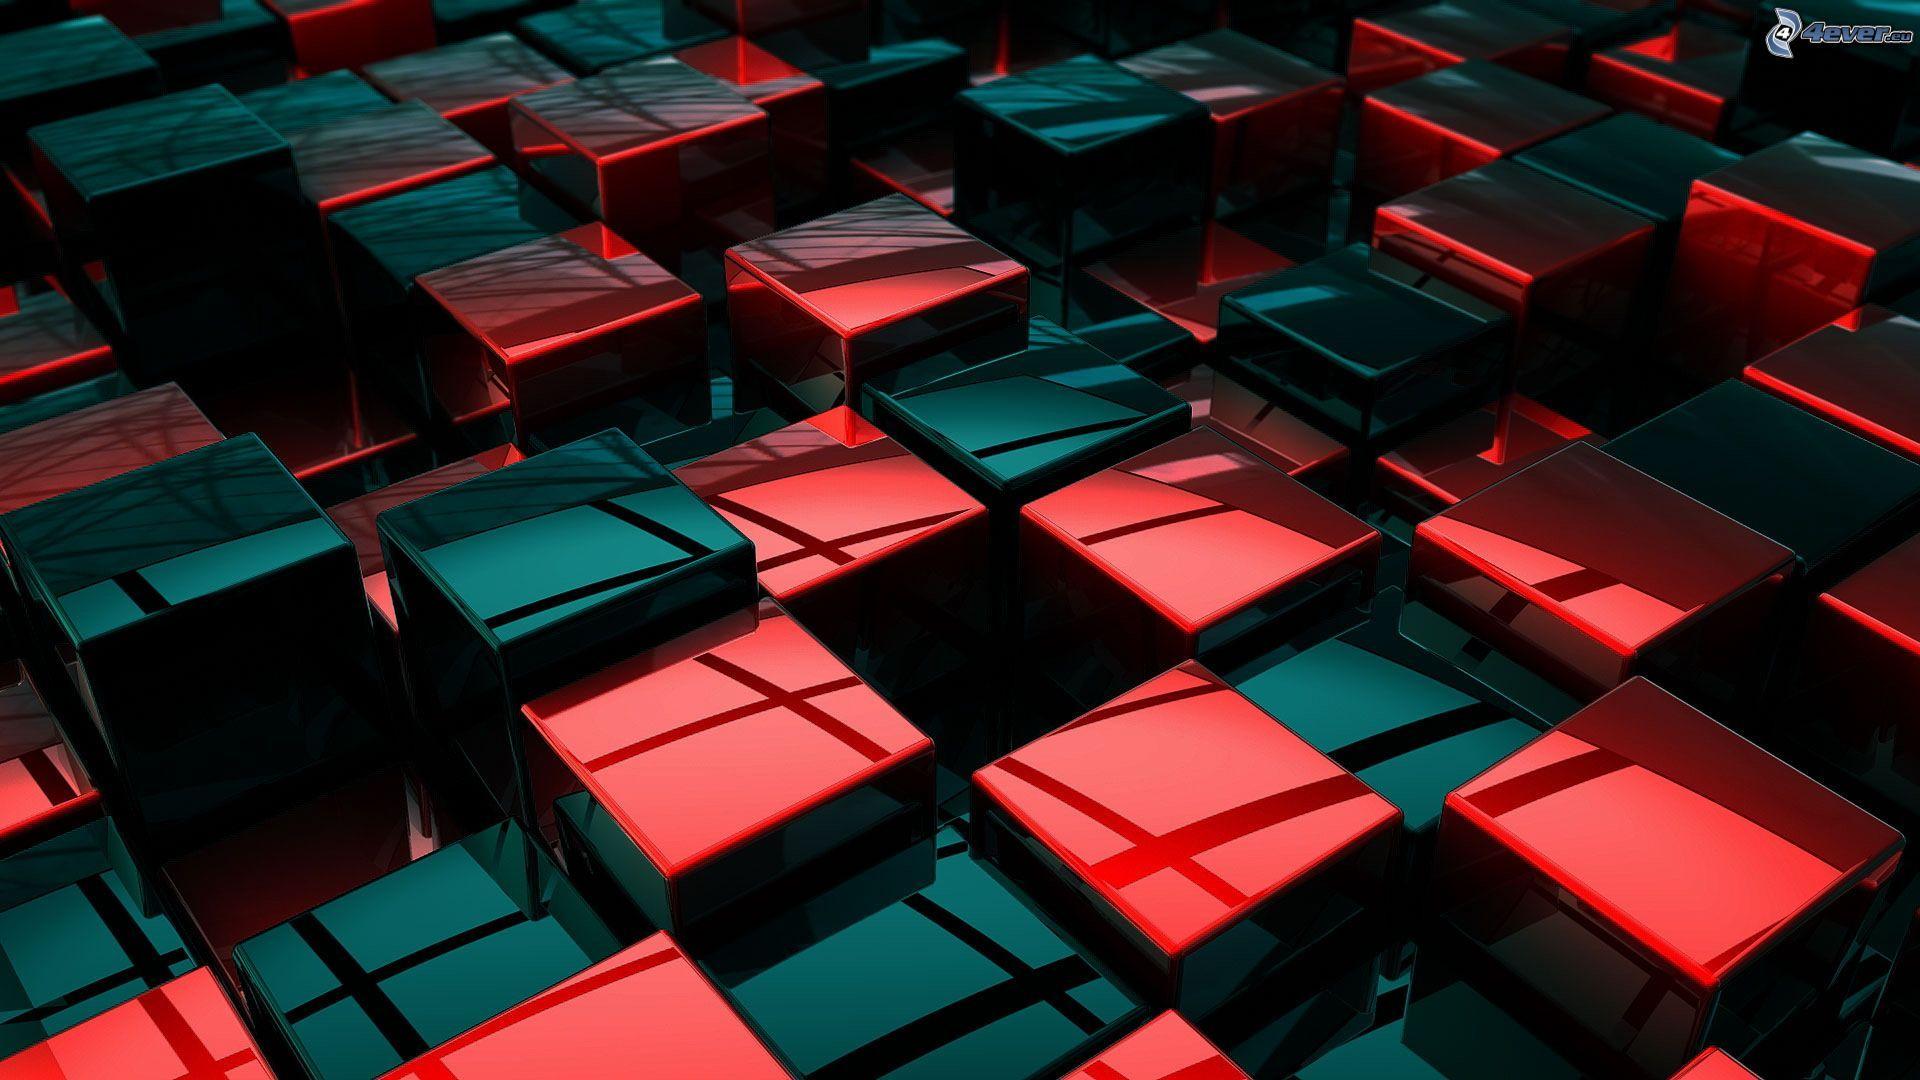 Wallpaper 3d Cubes